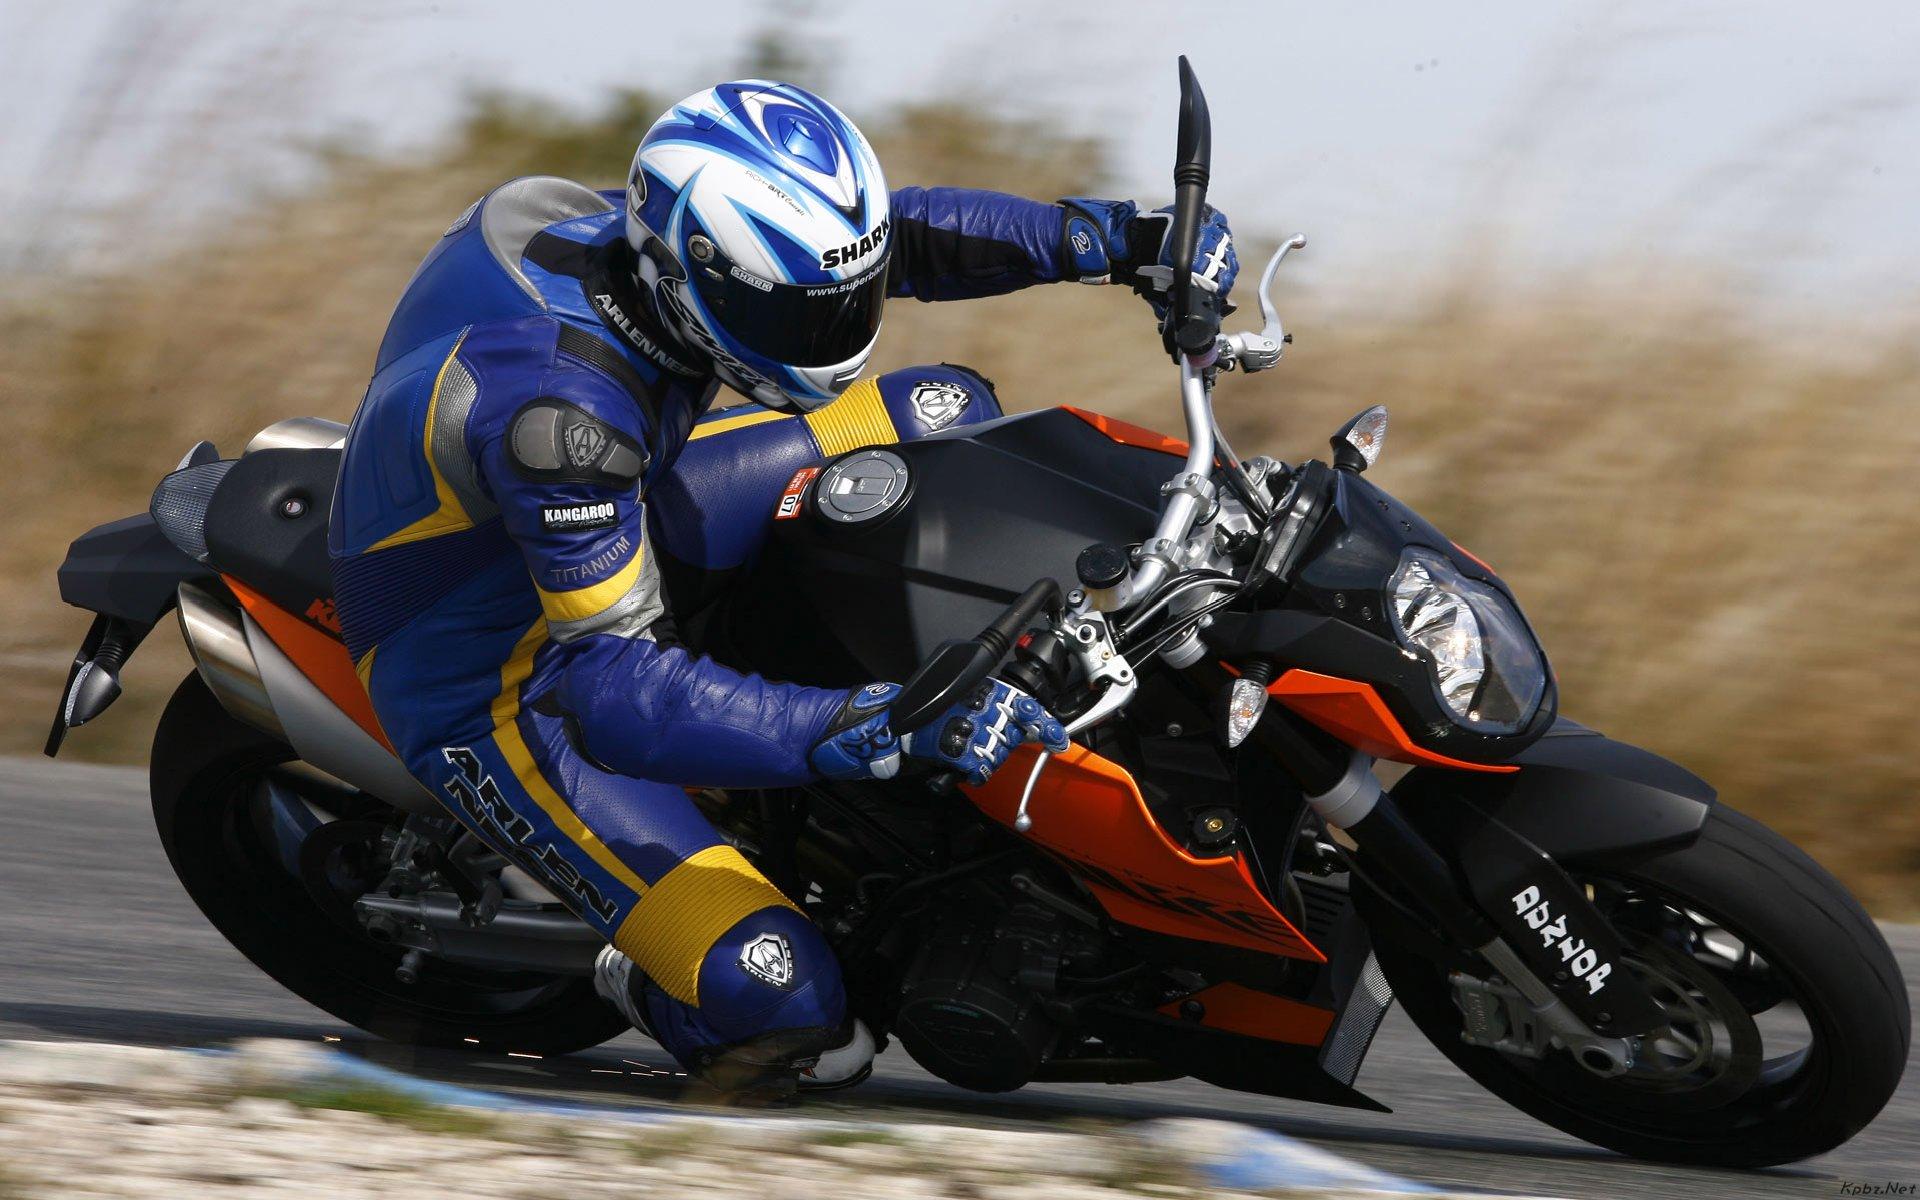 Мотобайк, трасса, гонщик, мотоцикл